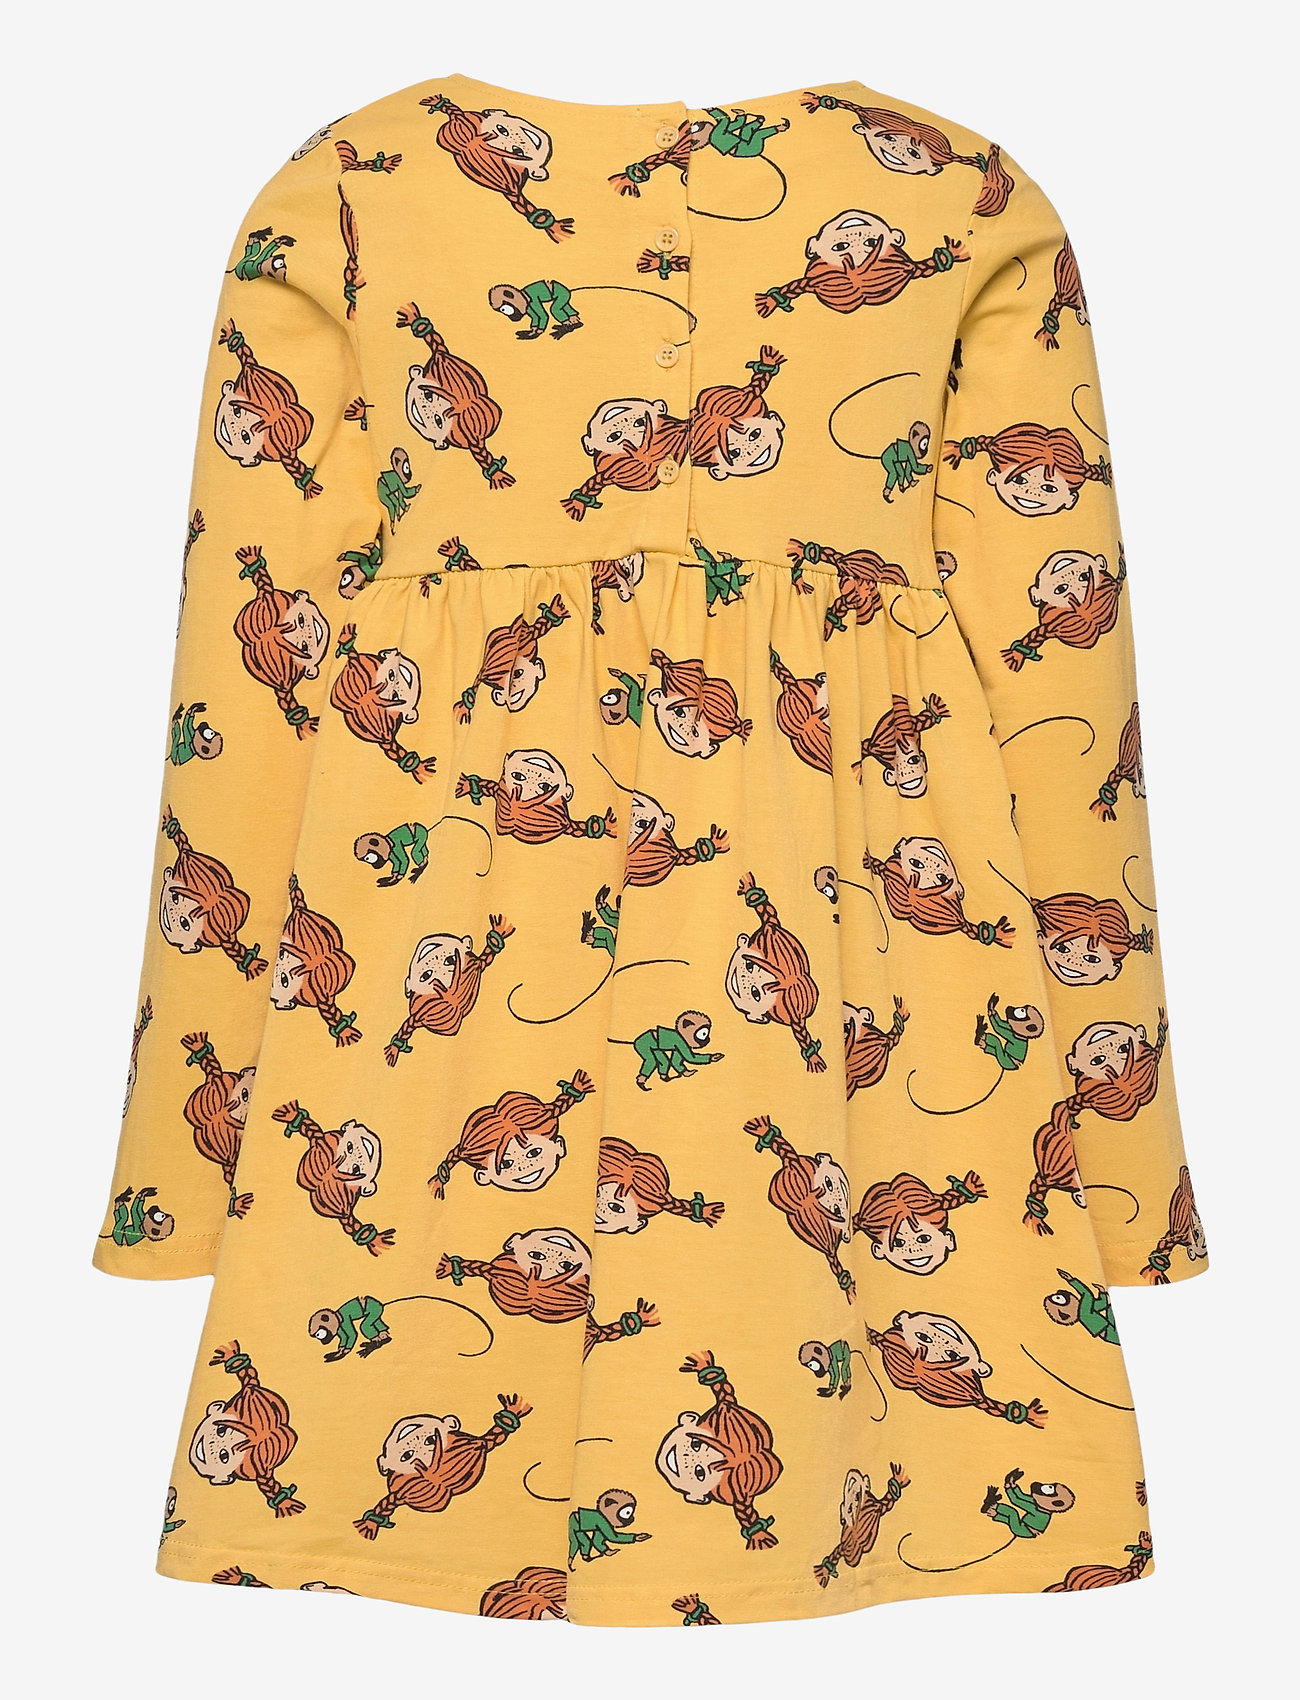 Martinex - PLAITS DRESS - kleider - yellow - 1